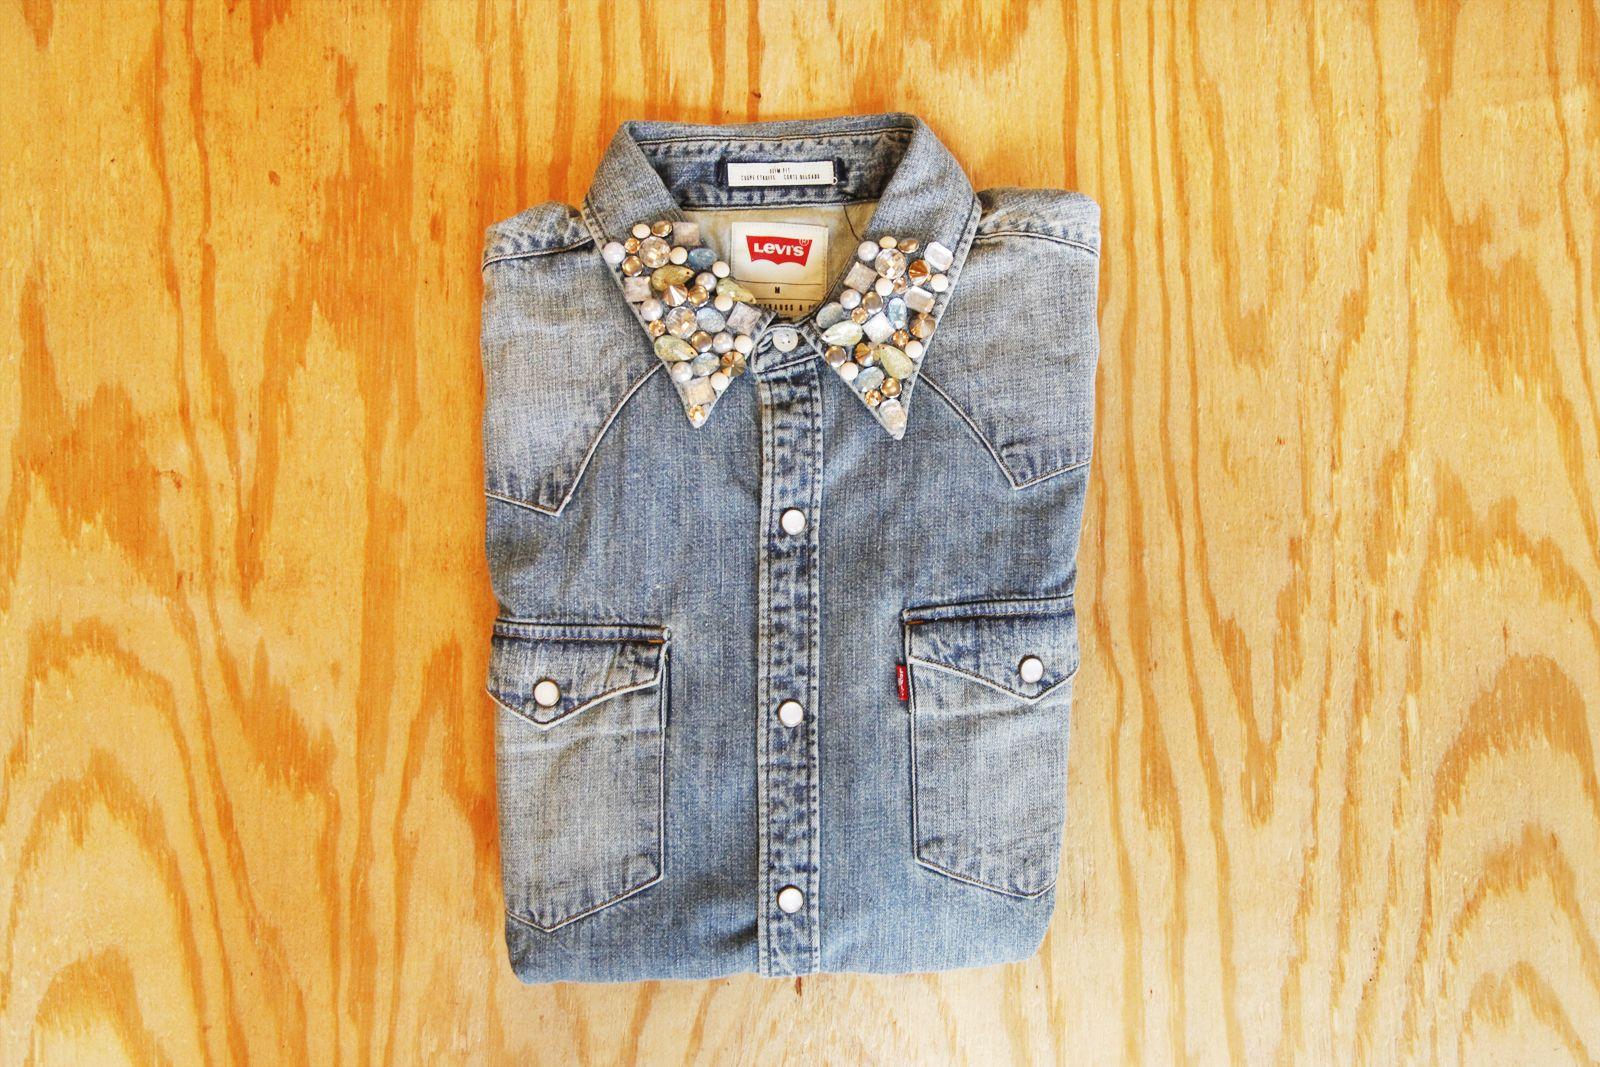 Diy your shirt collar with studs and jewels denim diy